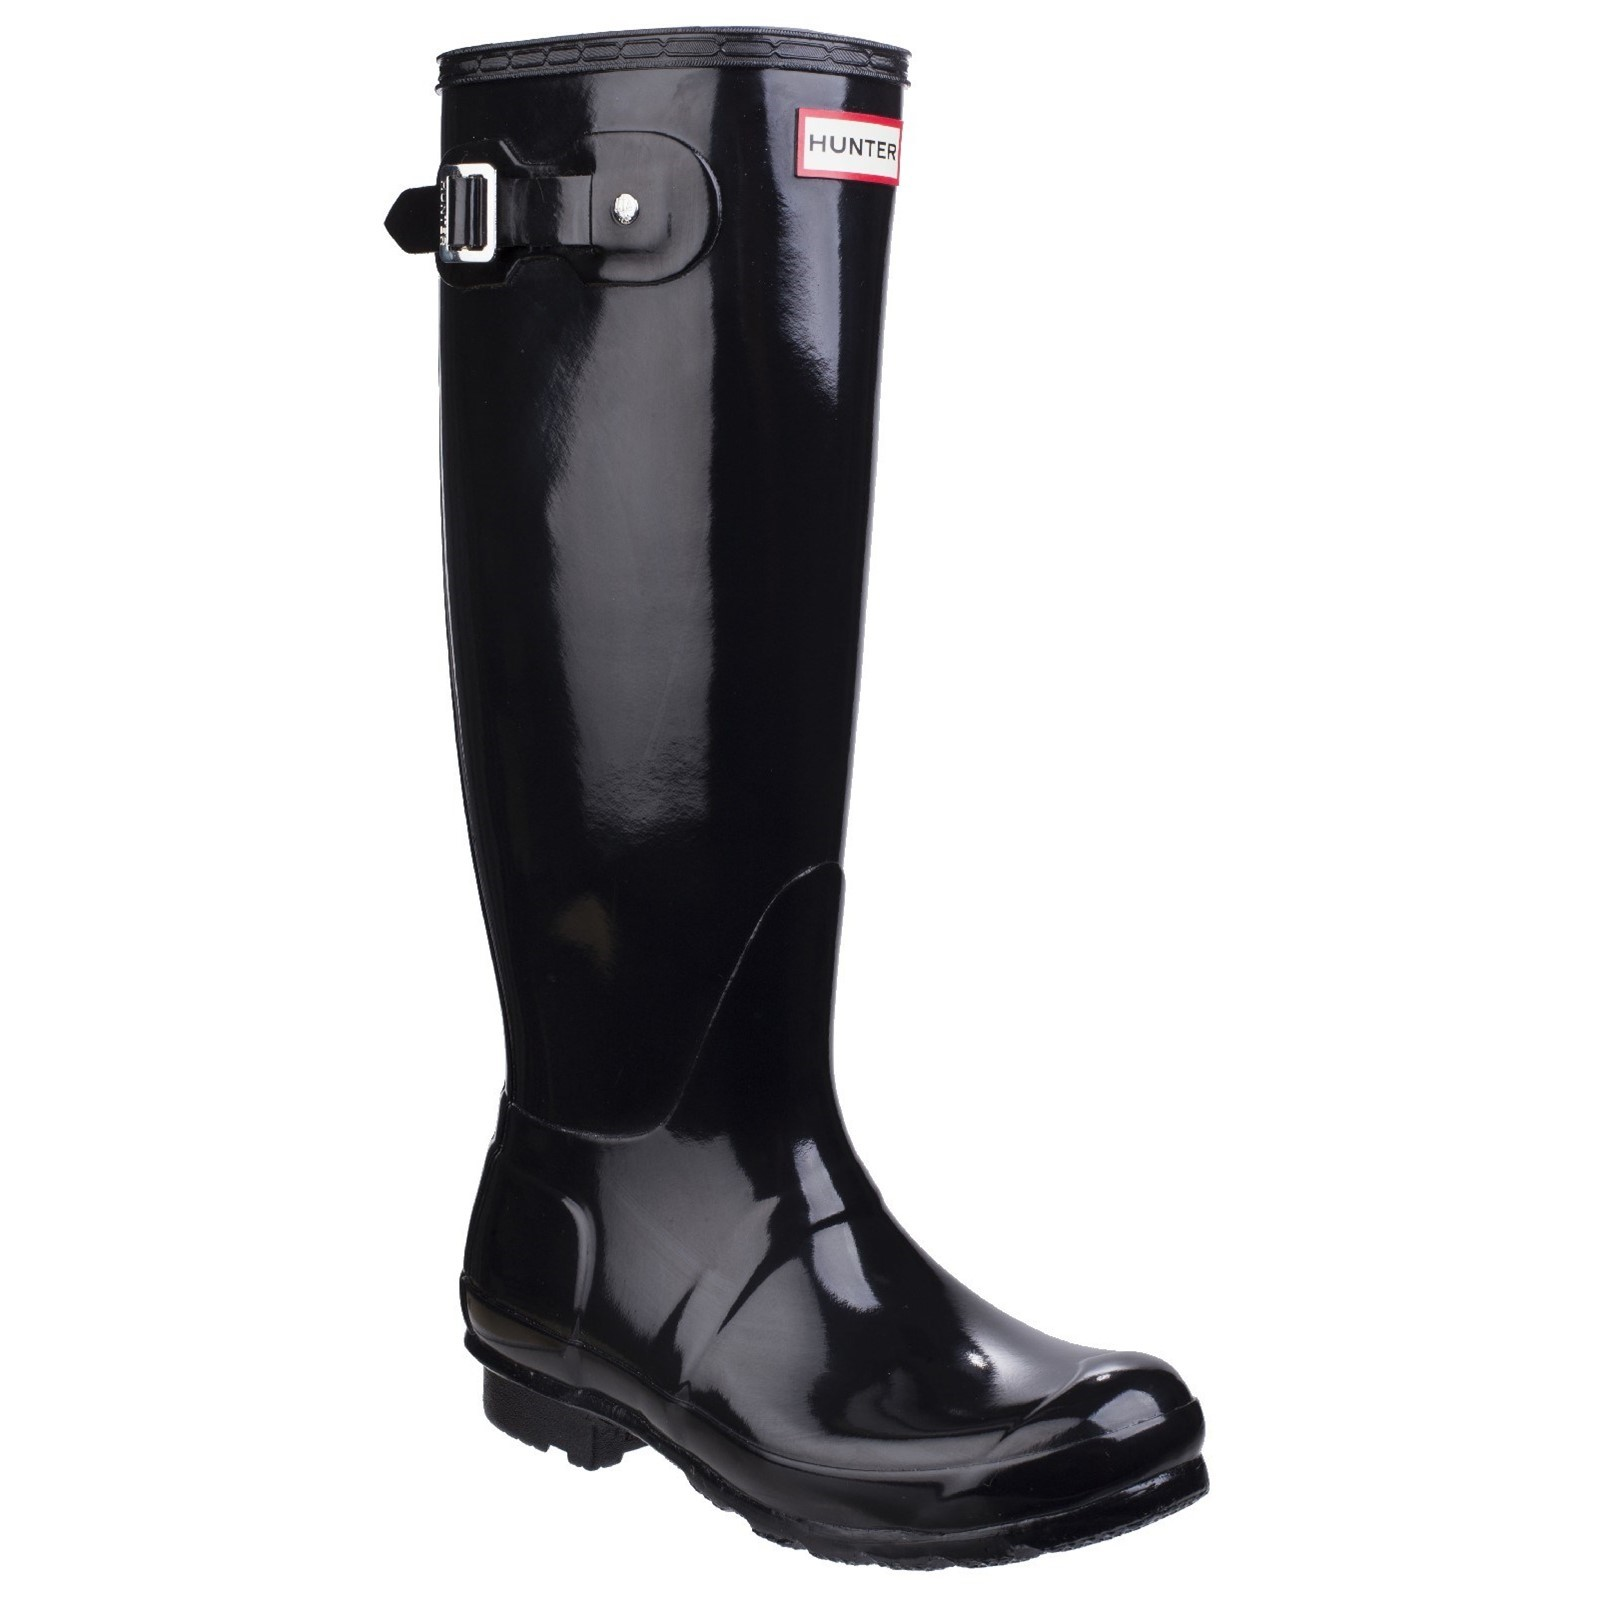 Womens Original Tall Gloss Wellington Boots Black from 6PM.COM